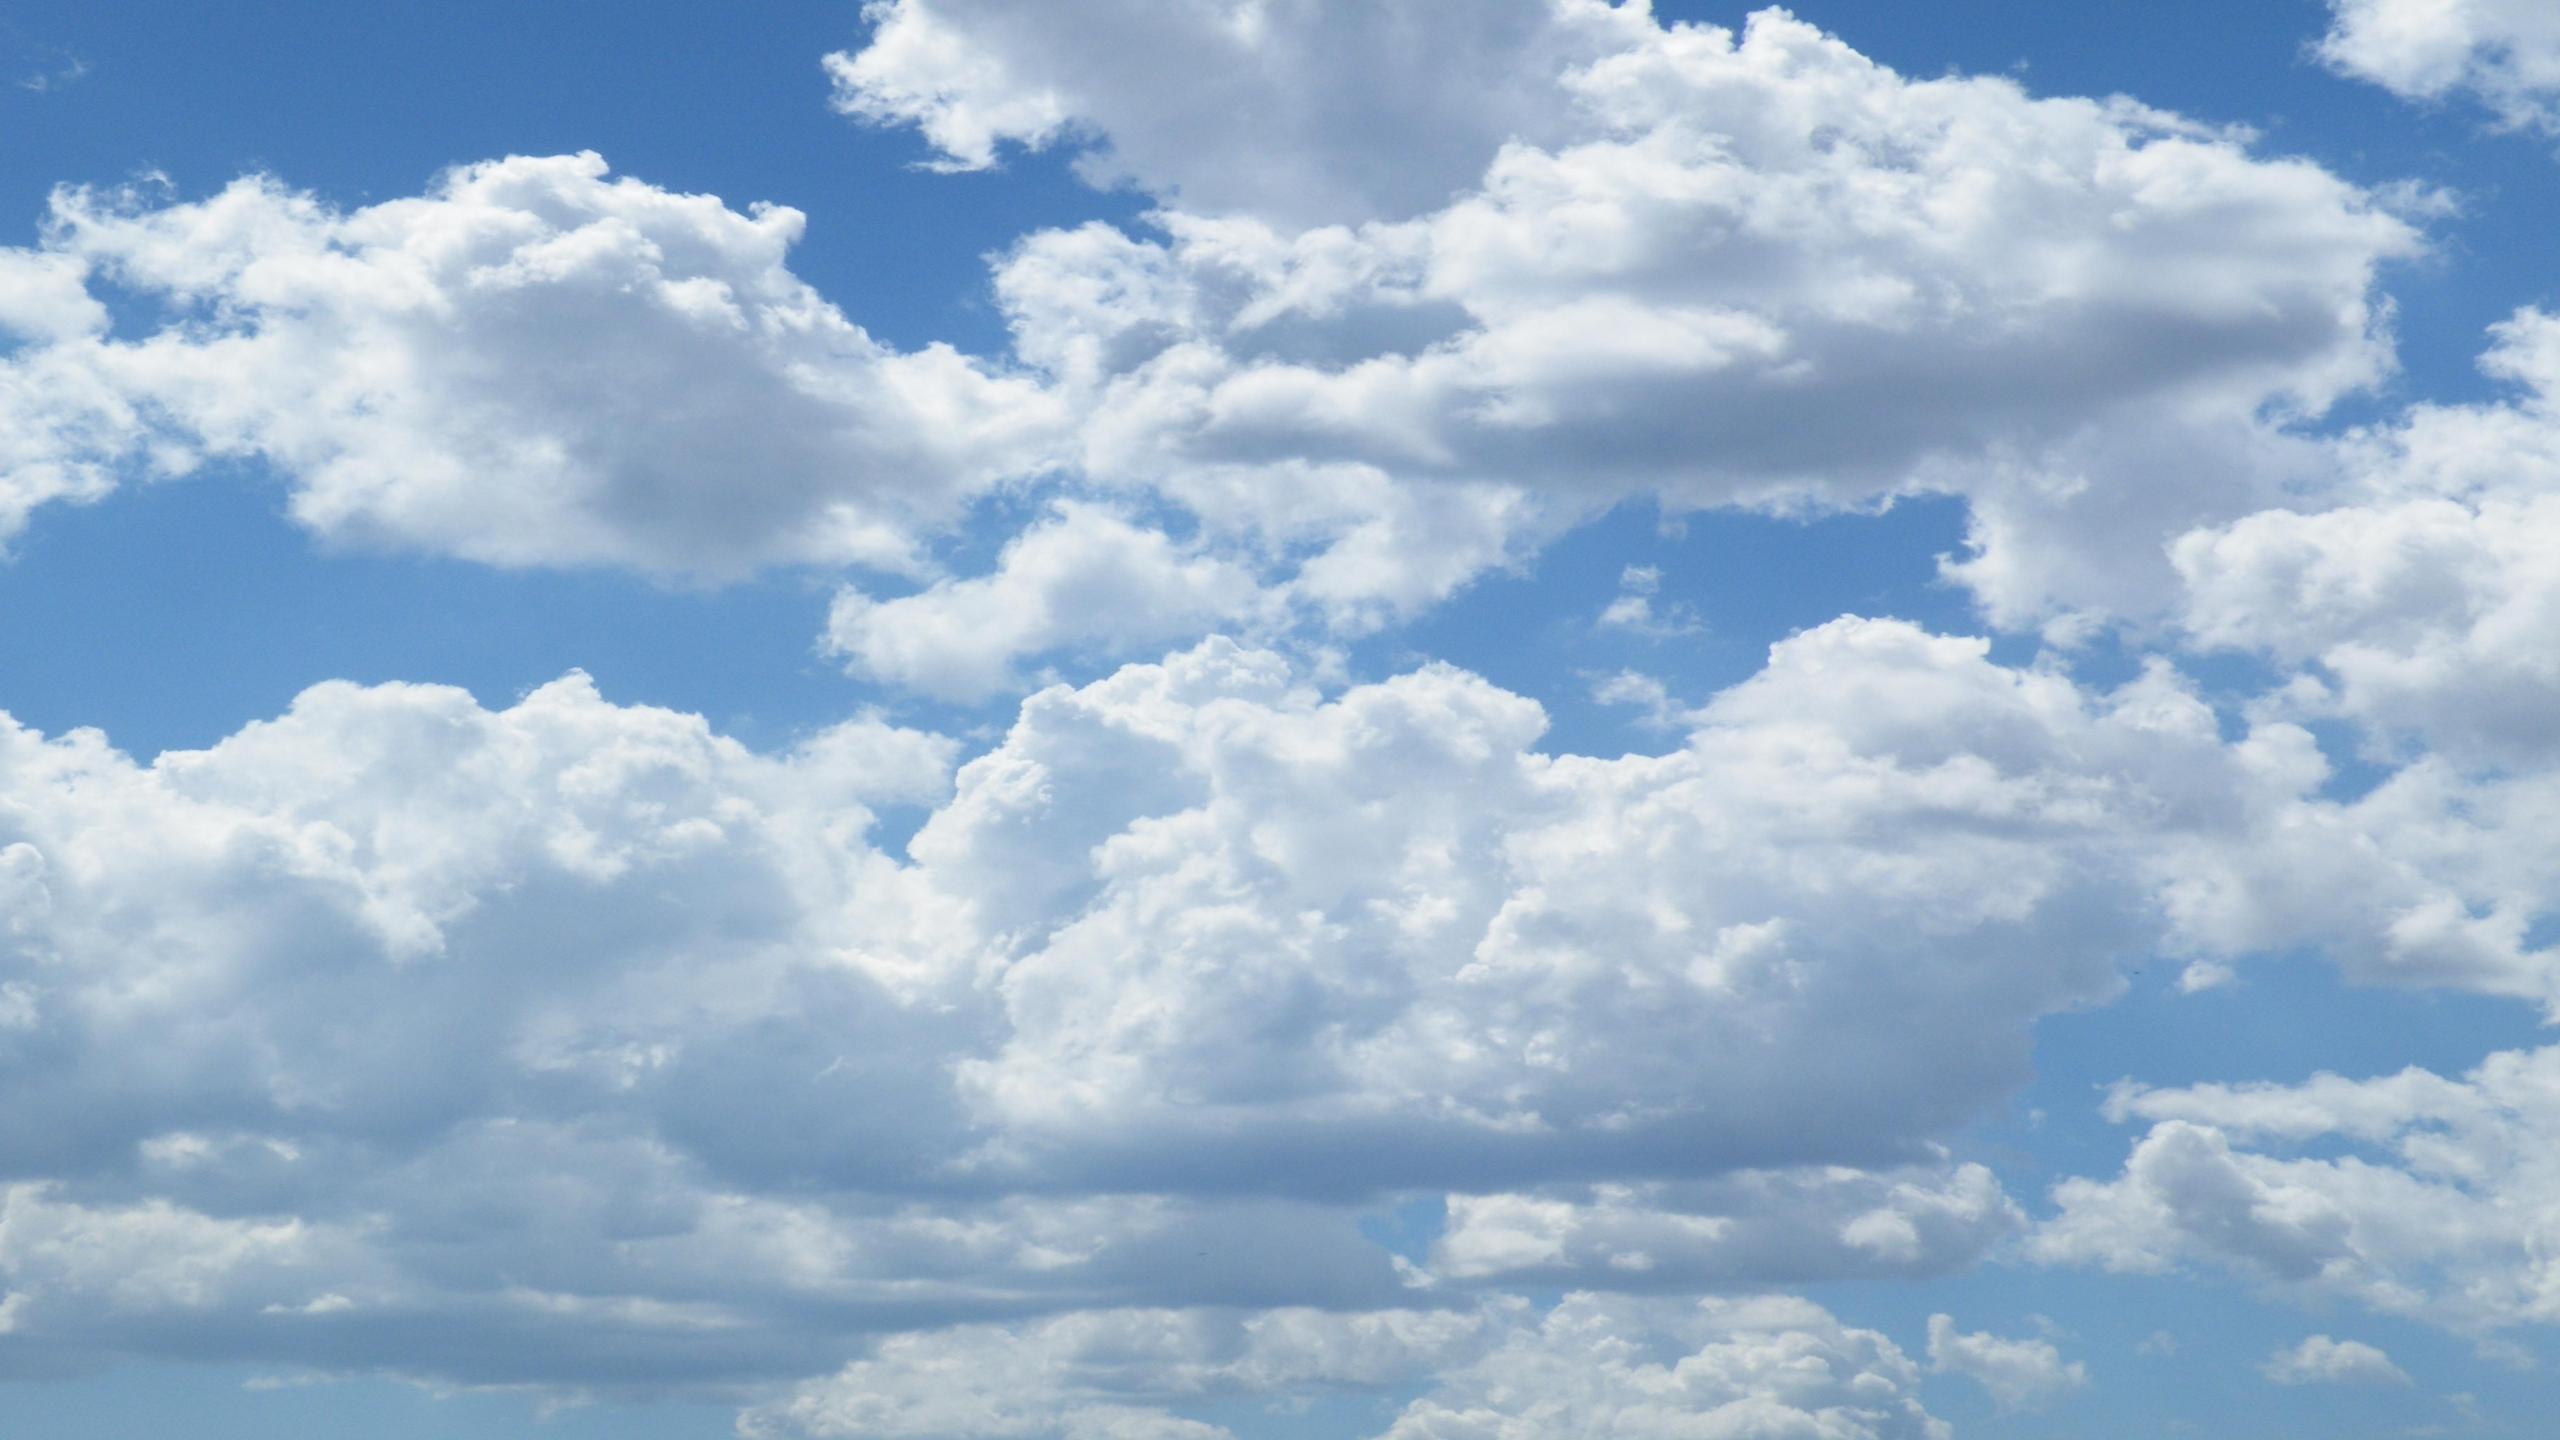 Labels Sky Cloud Wallpapers Hd: Clouds HD Wallpaper